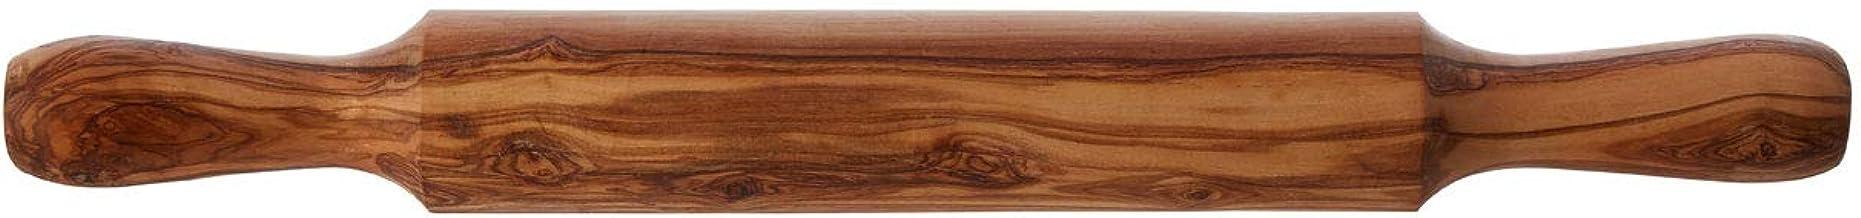 Premier Housewares 1104750 Rolling Pin, Olive Wood